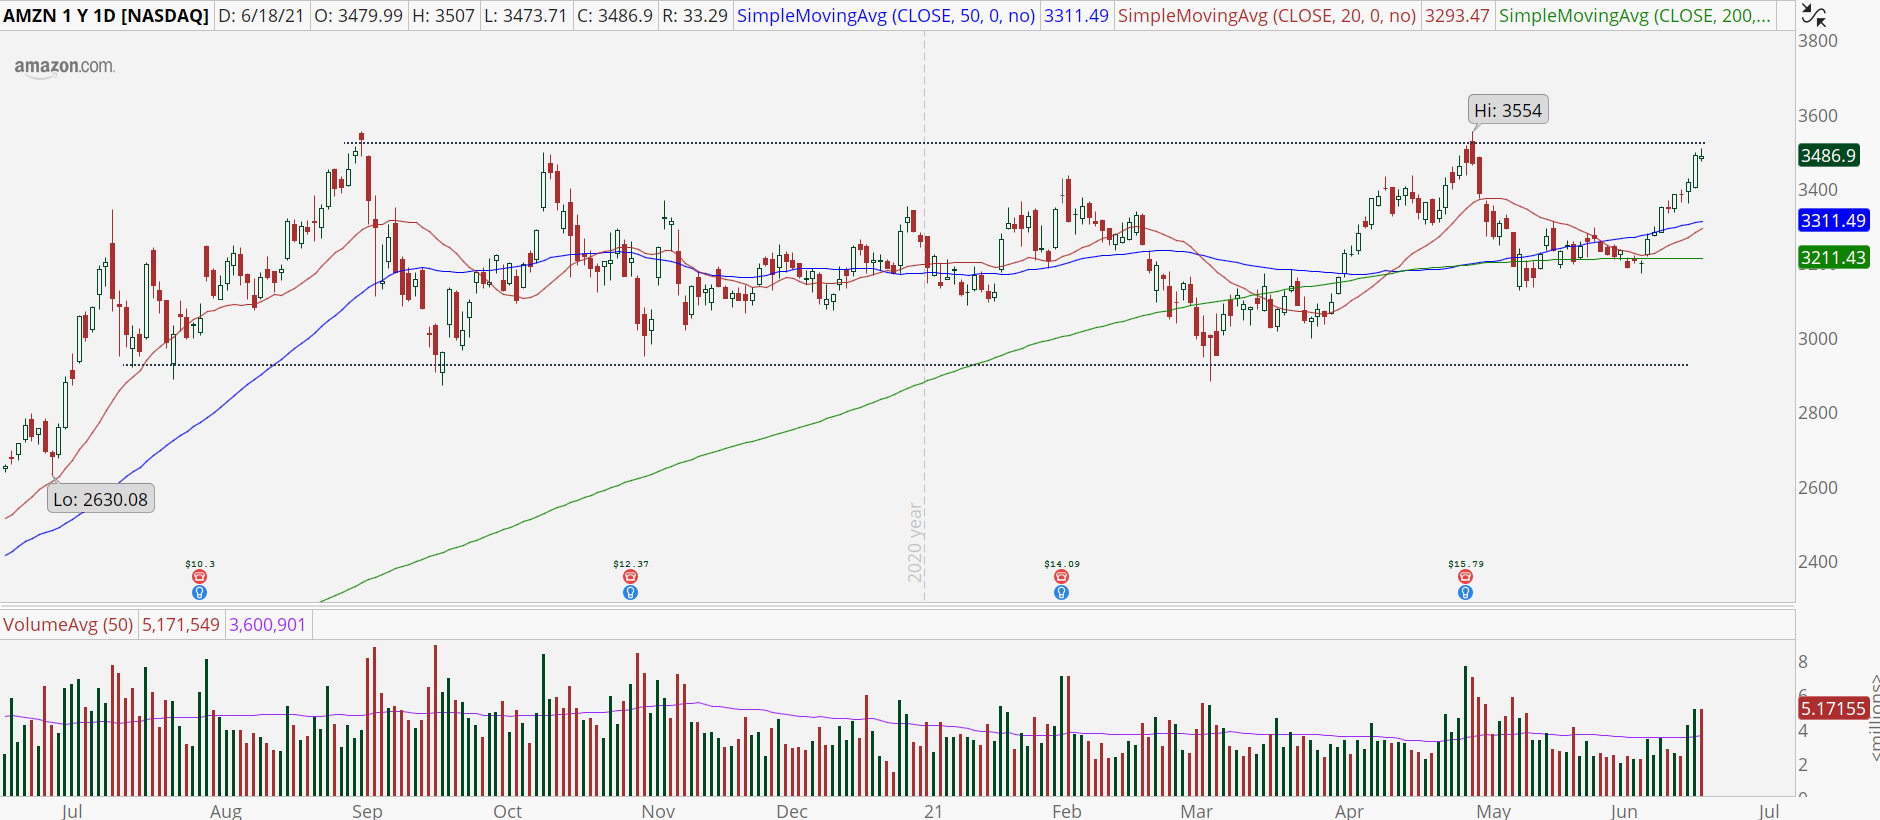 Amazon (AMZN) stock chart with imminent breakout